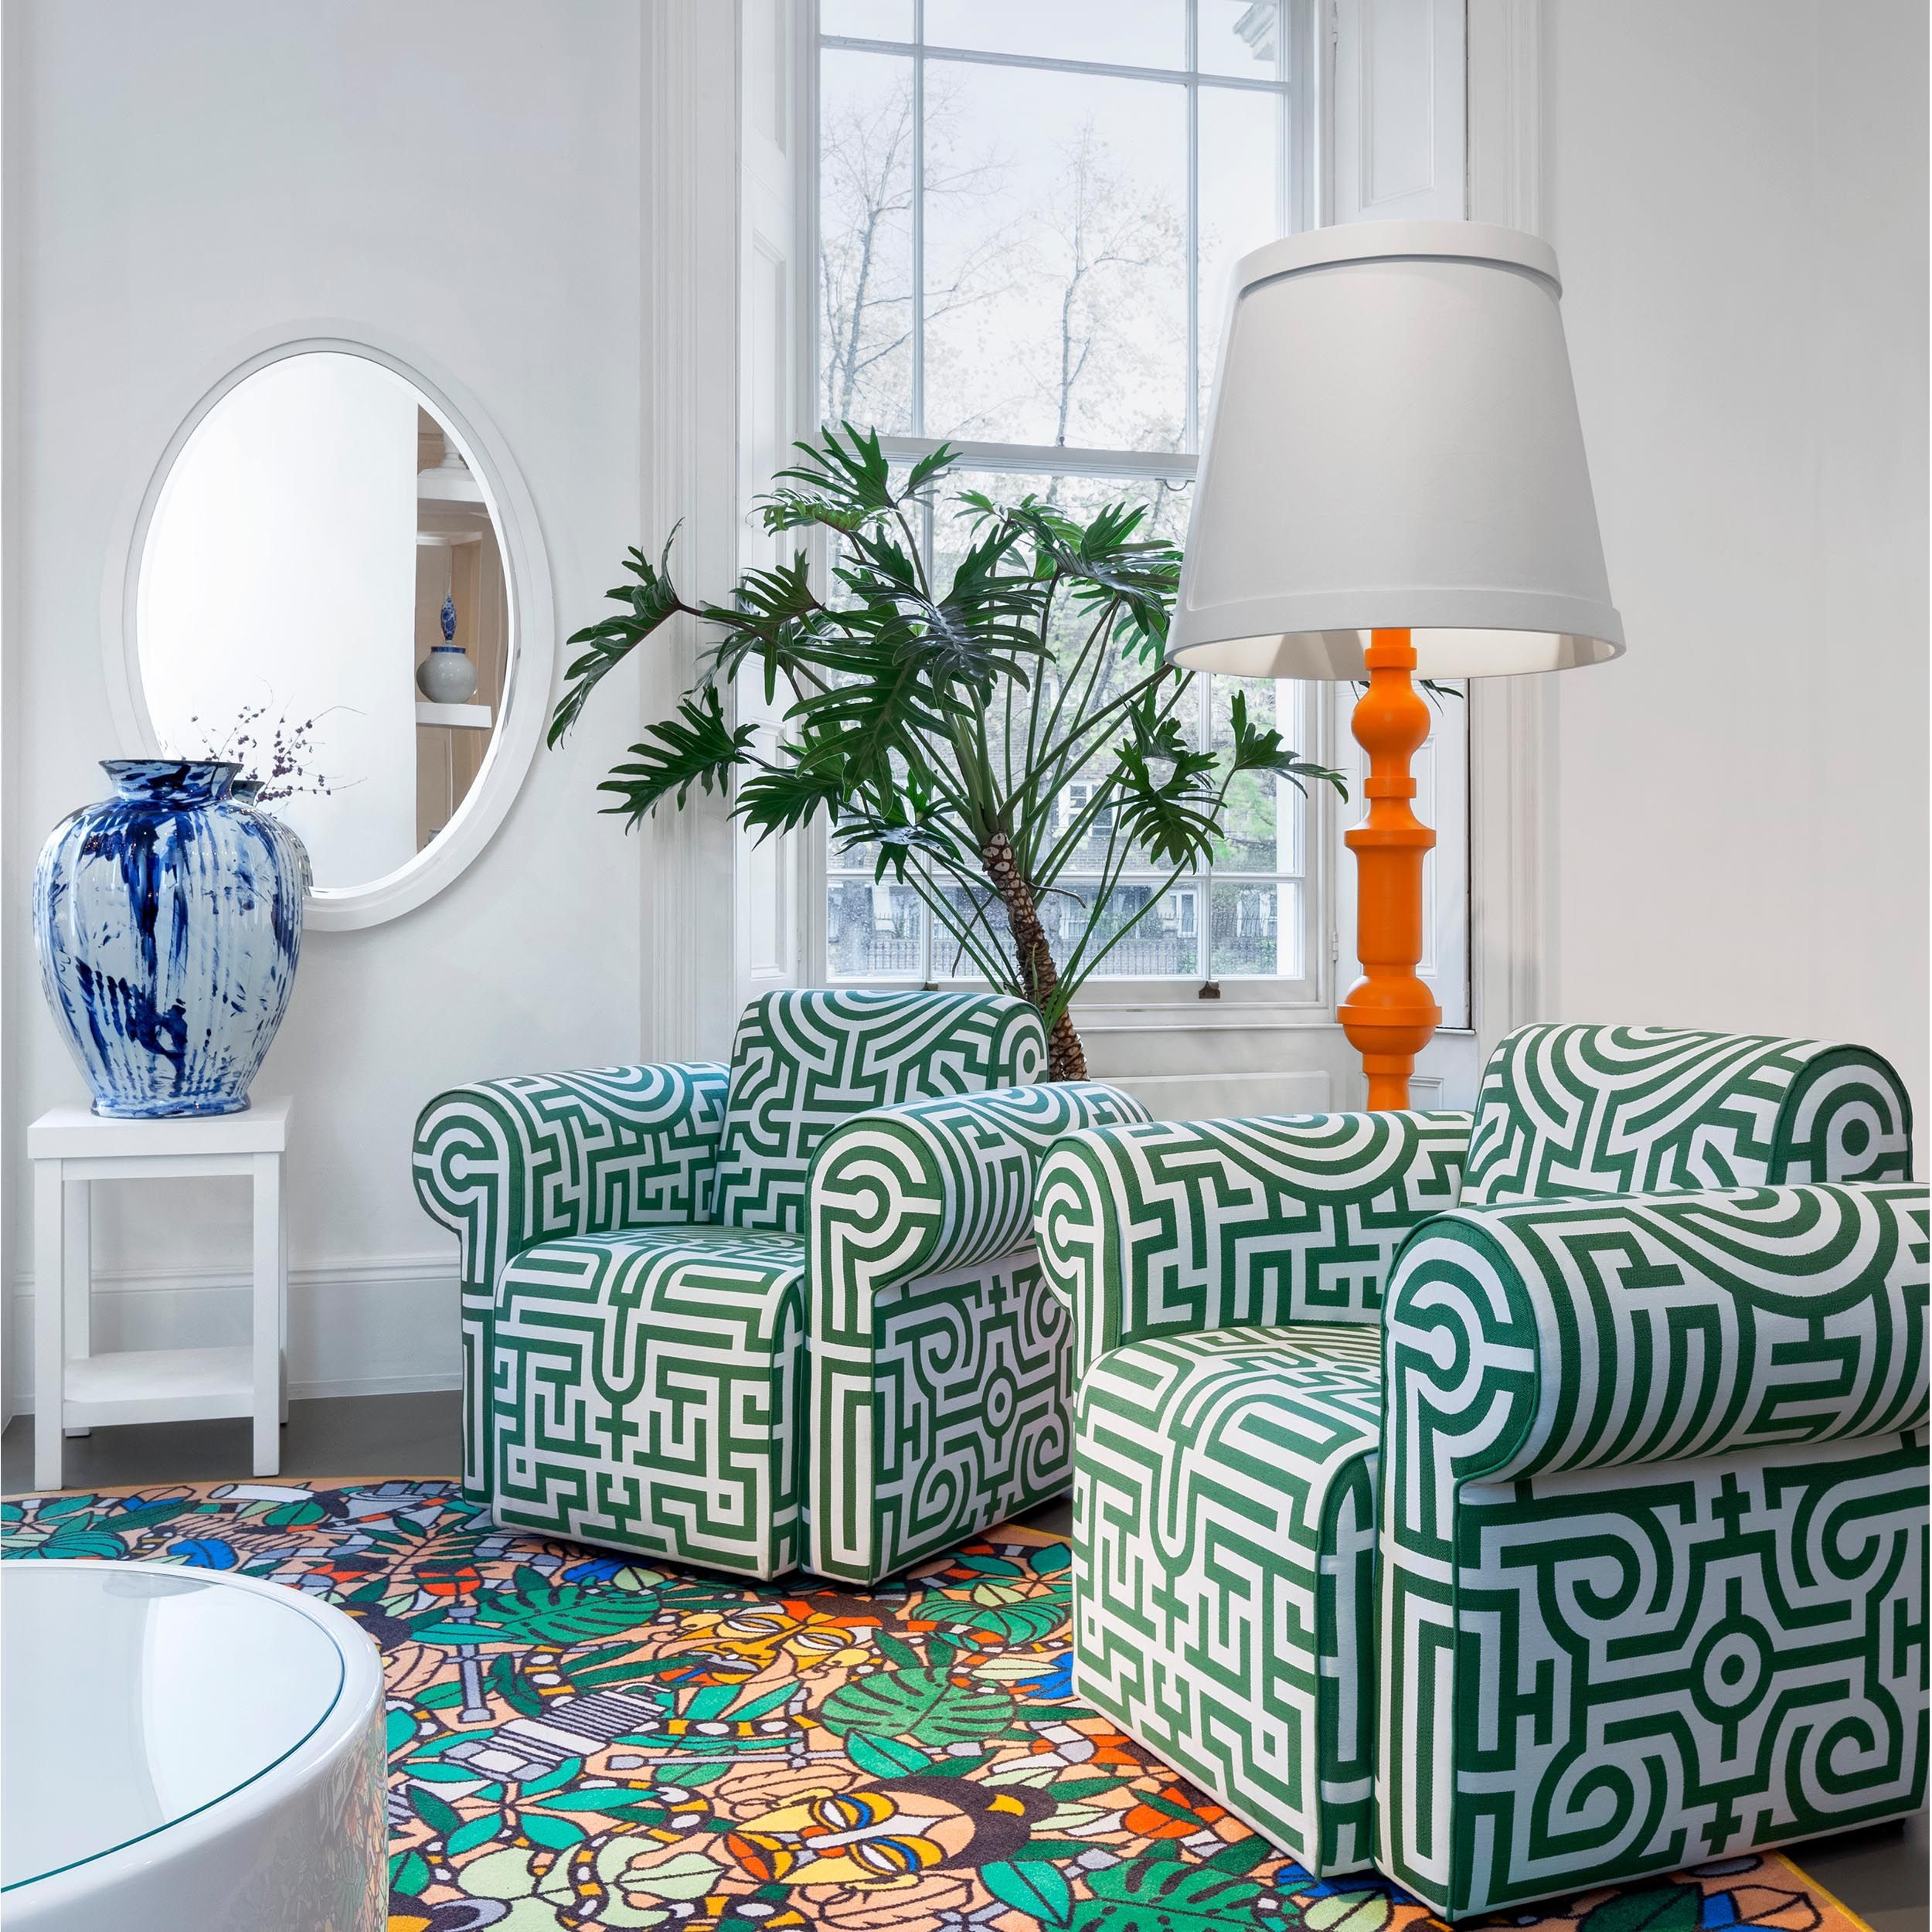 Labyrinth Chair by Studio Job Moooicom zara home Pinterest